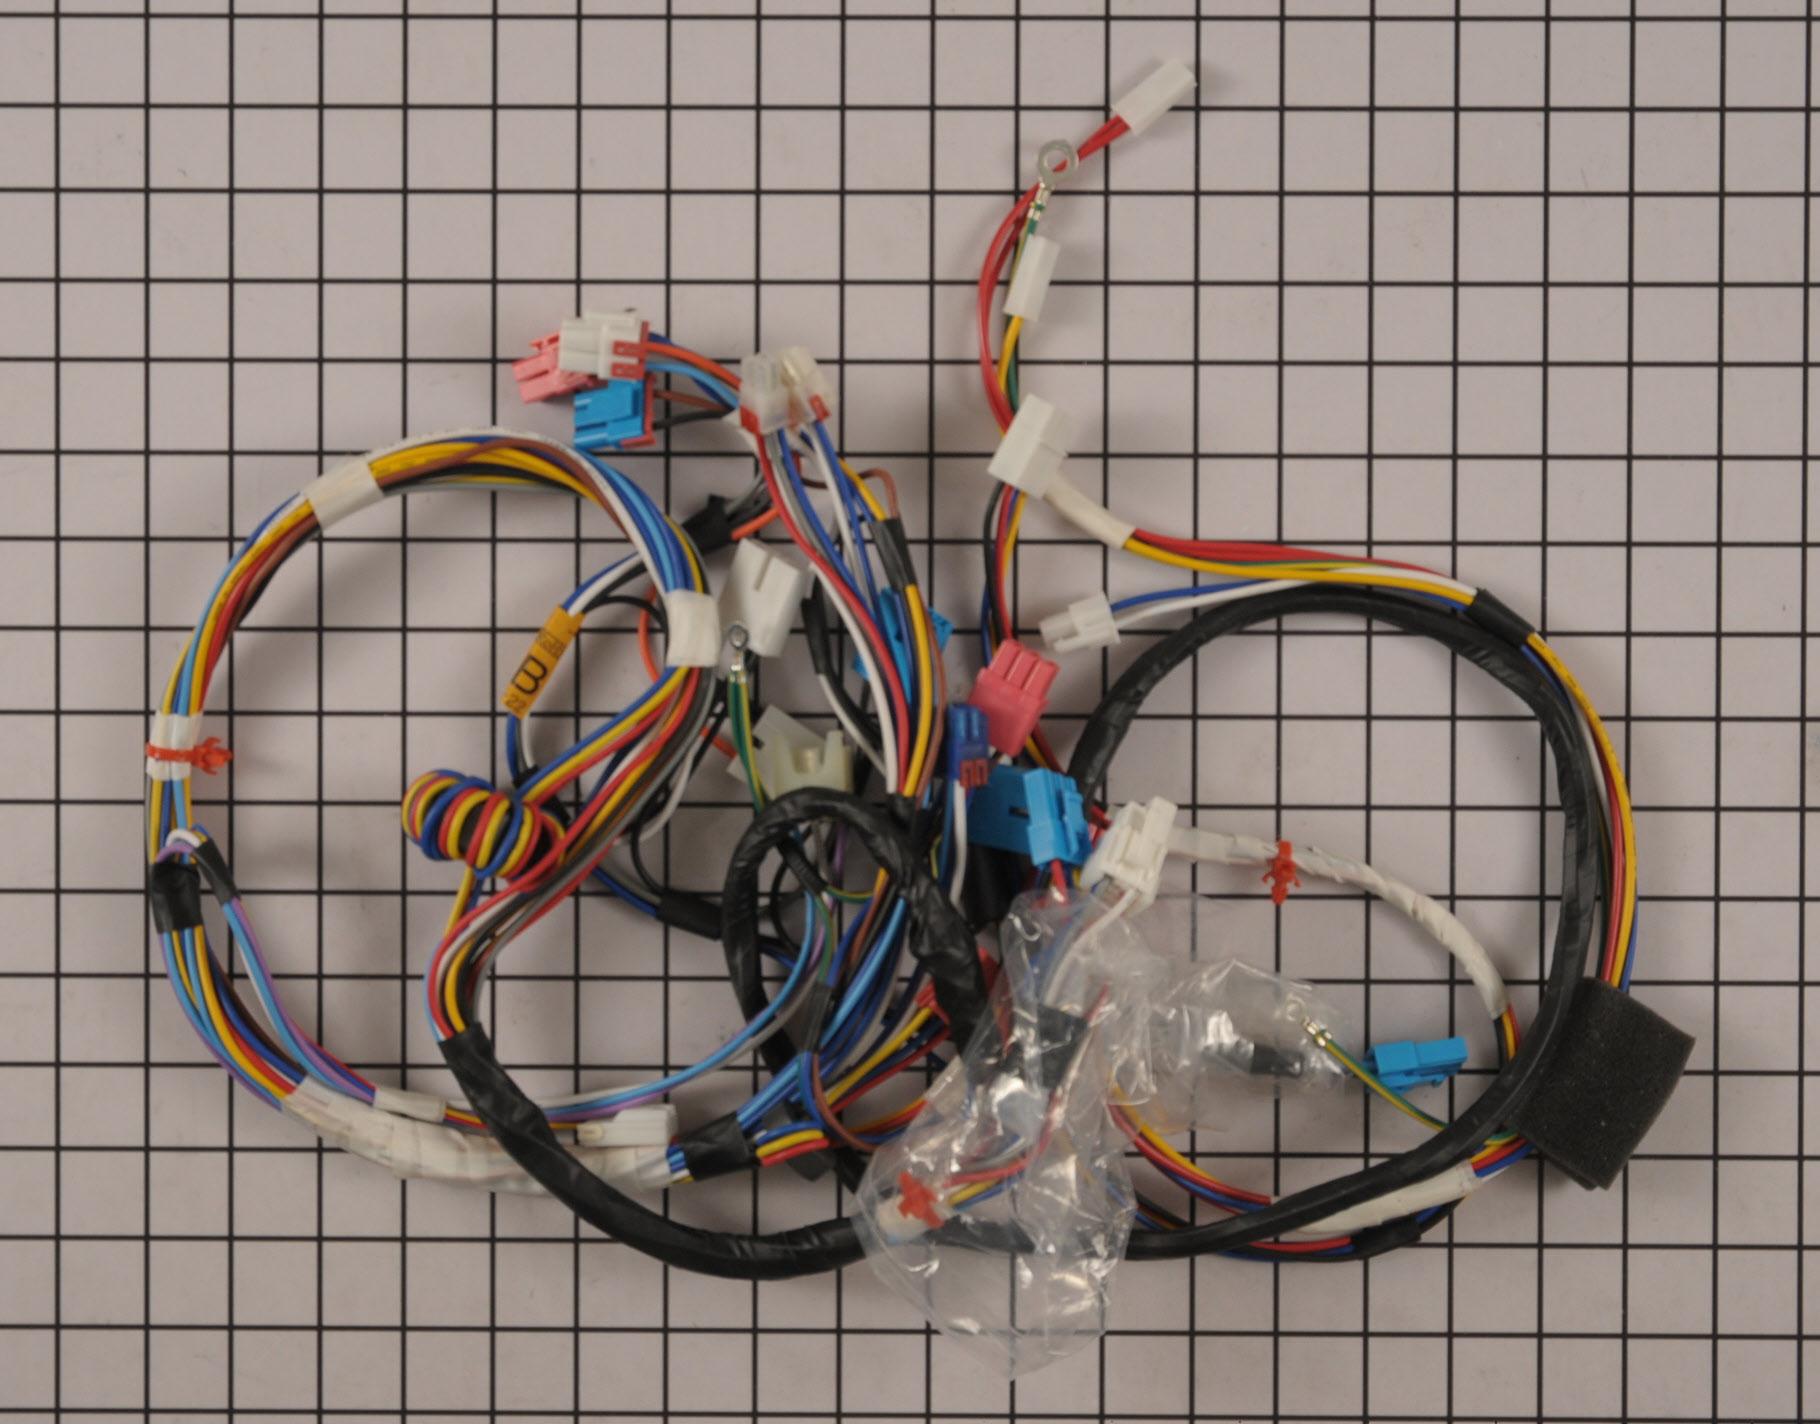 LG Washing Machine Part # 6877ER1015B - Wire Harness